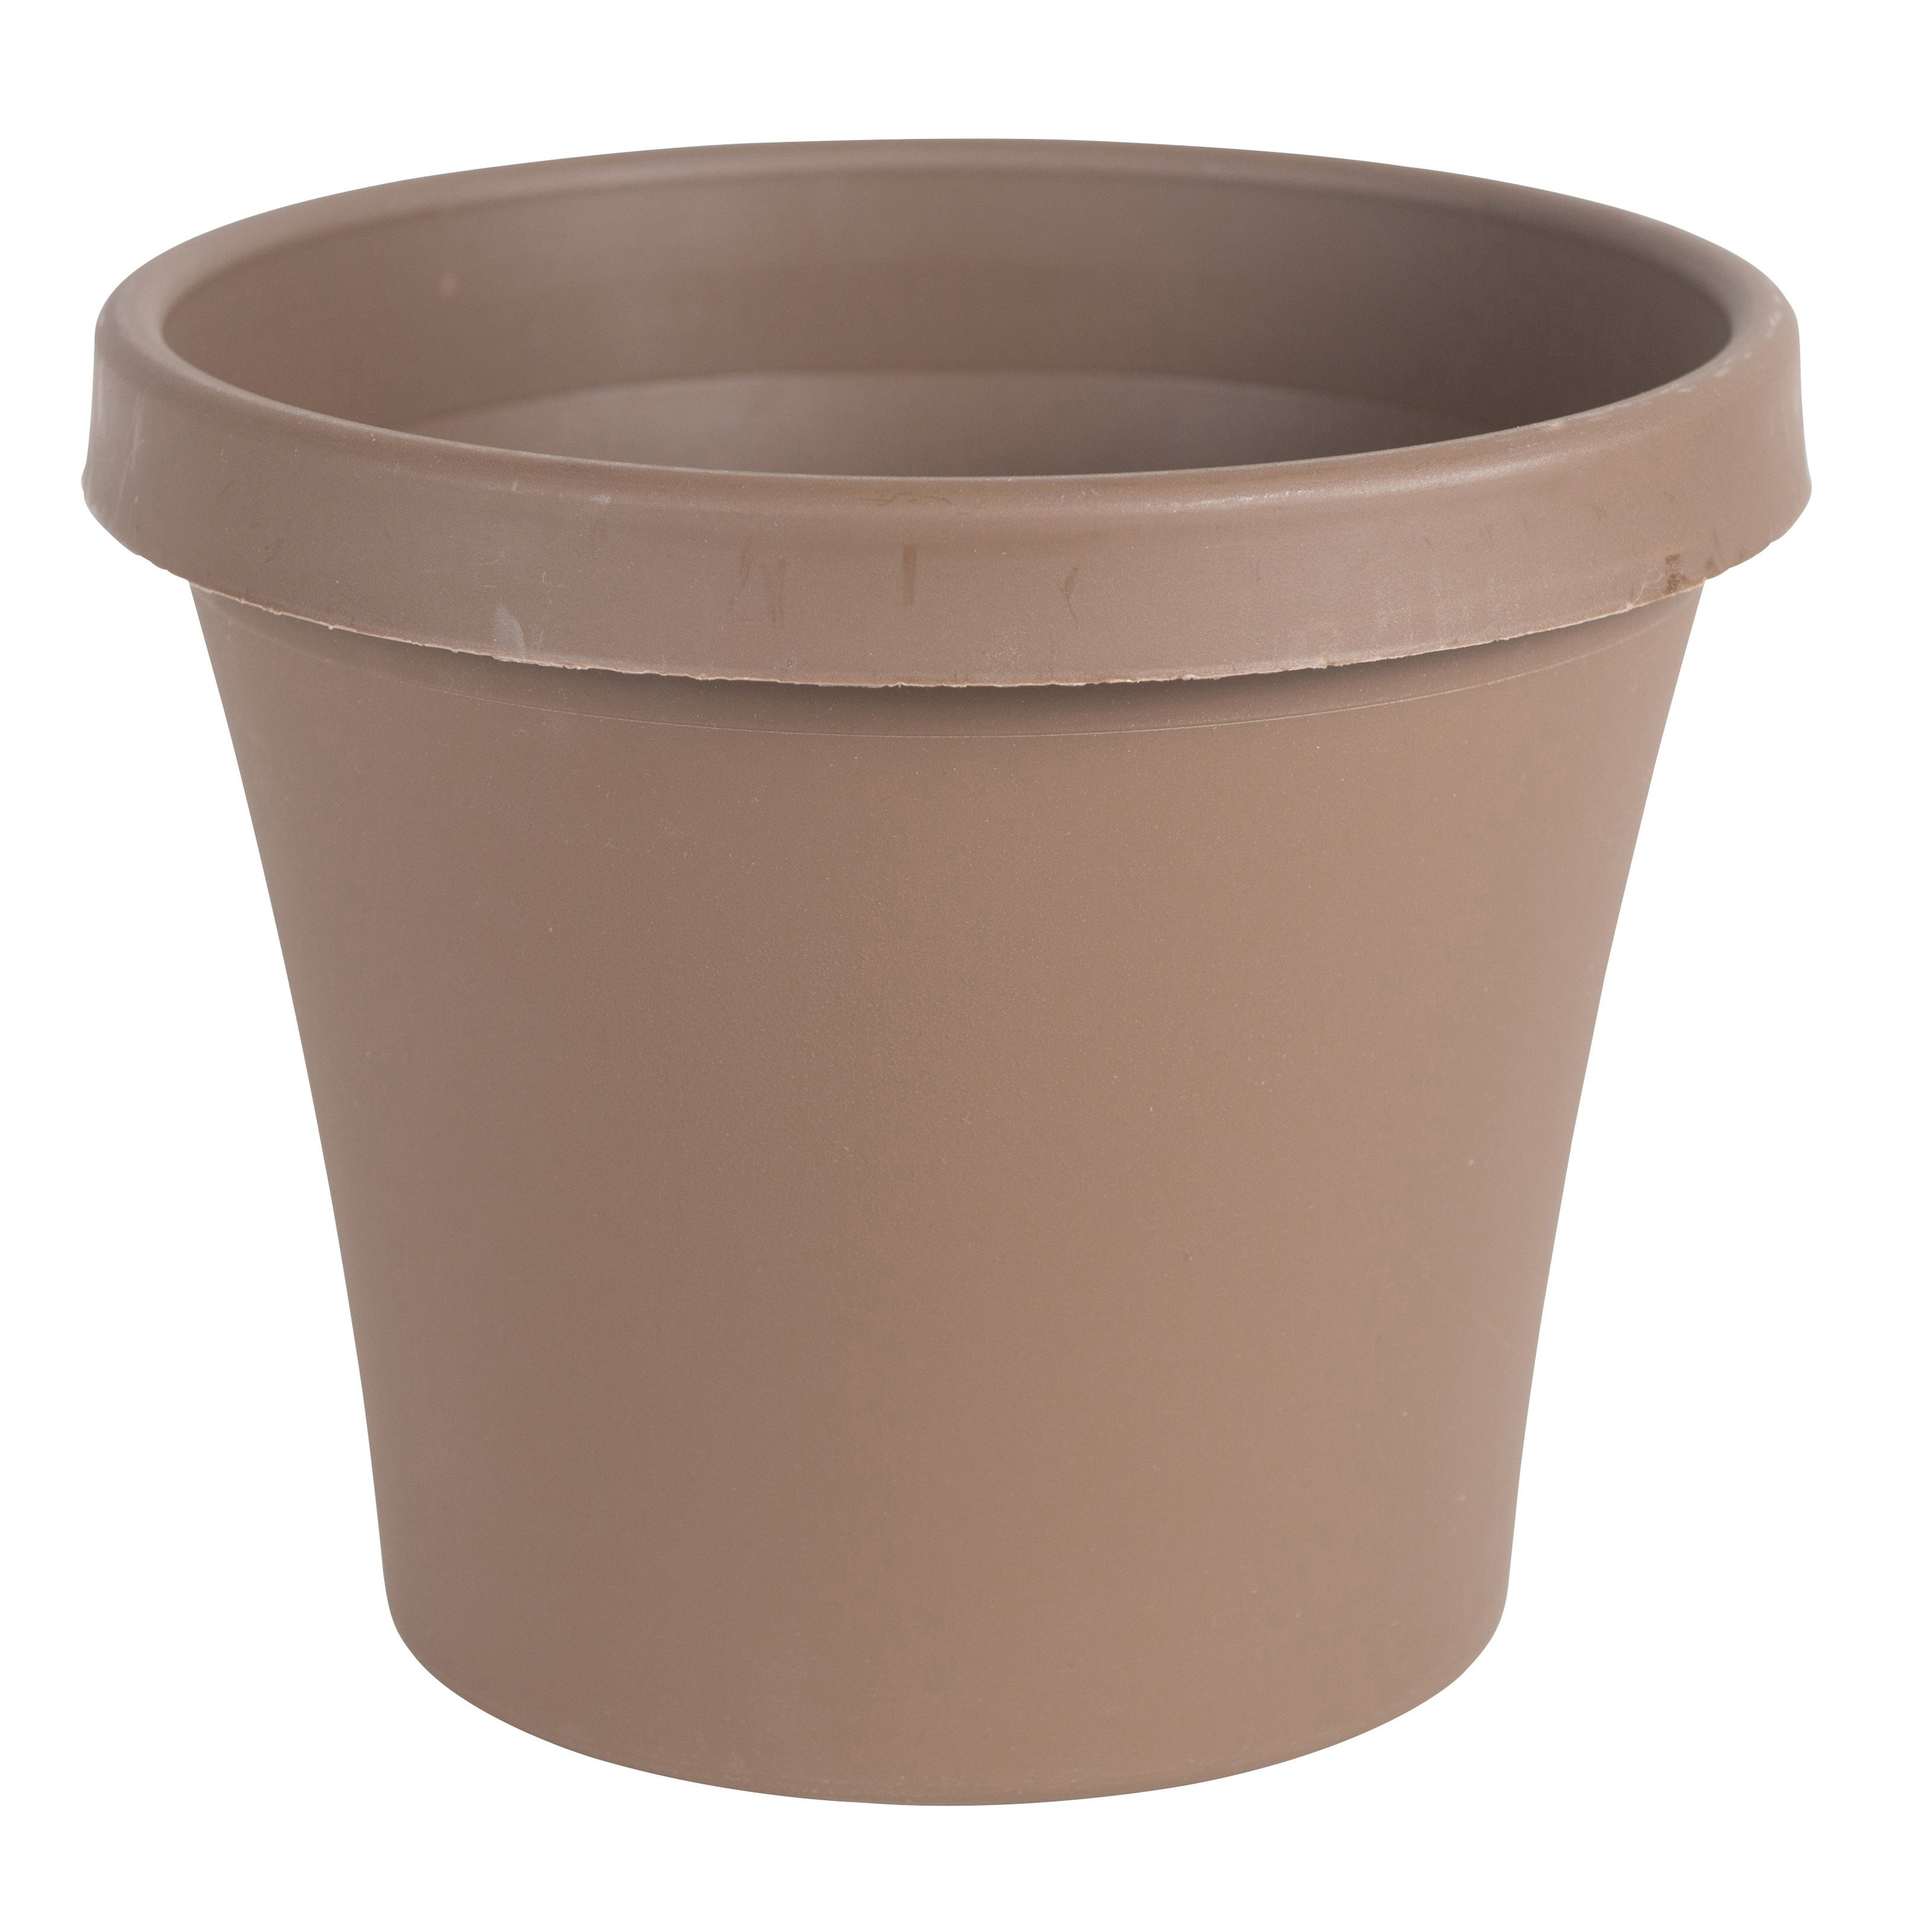 Bloem Terra Pot Planter Set of 2 by Bloem Apopka